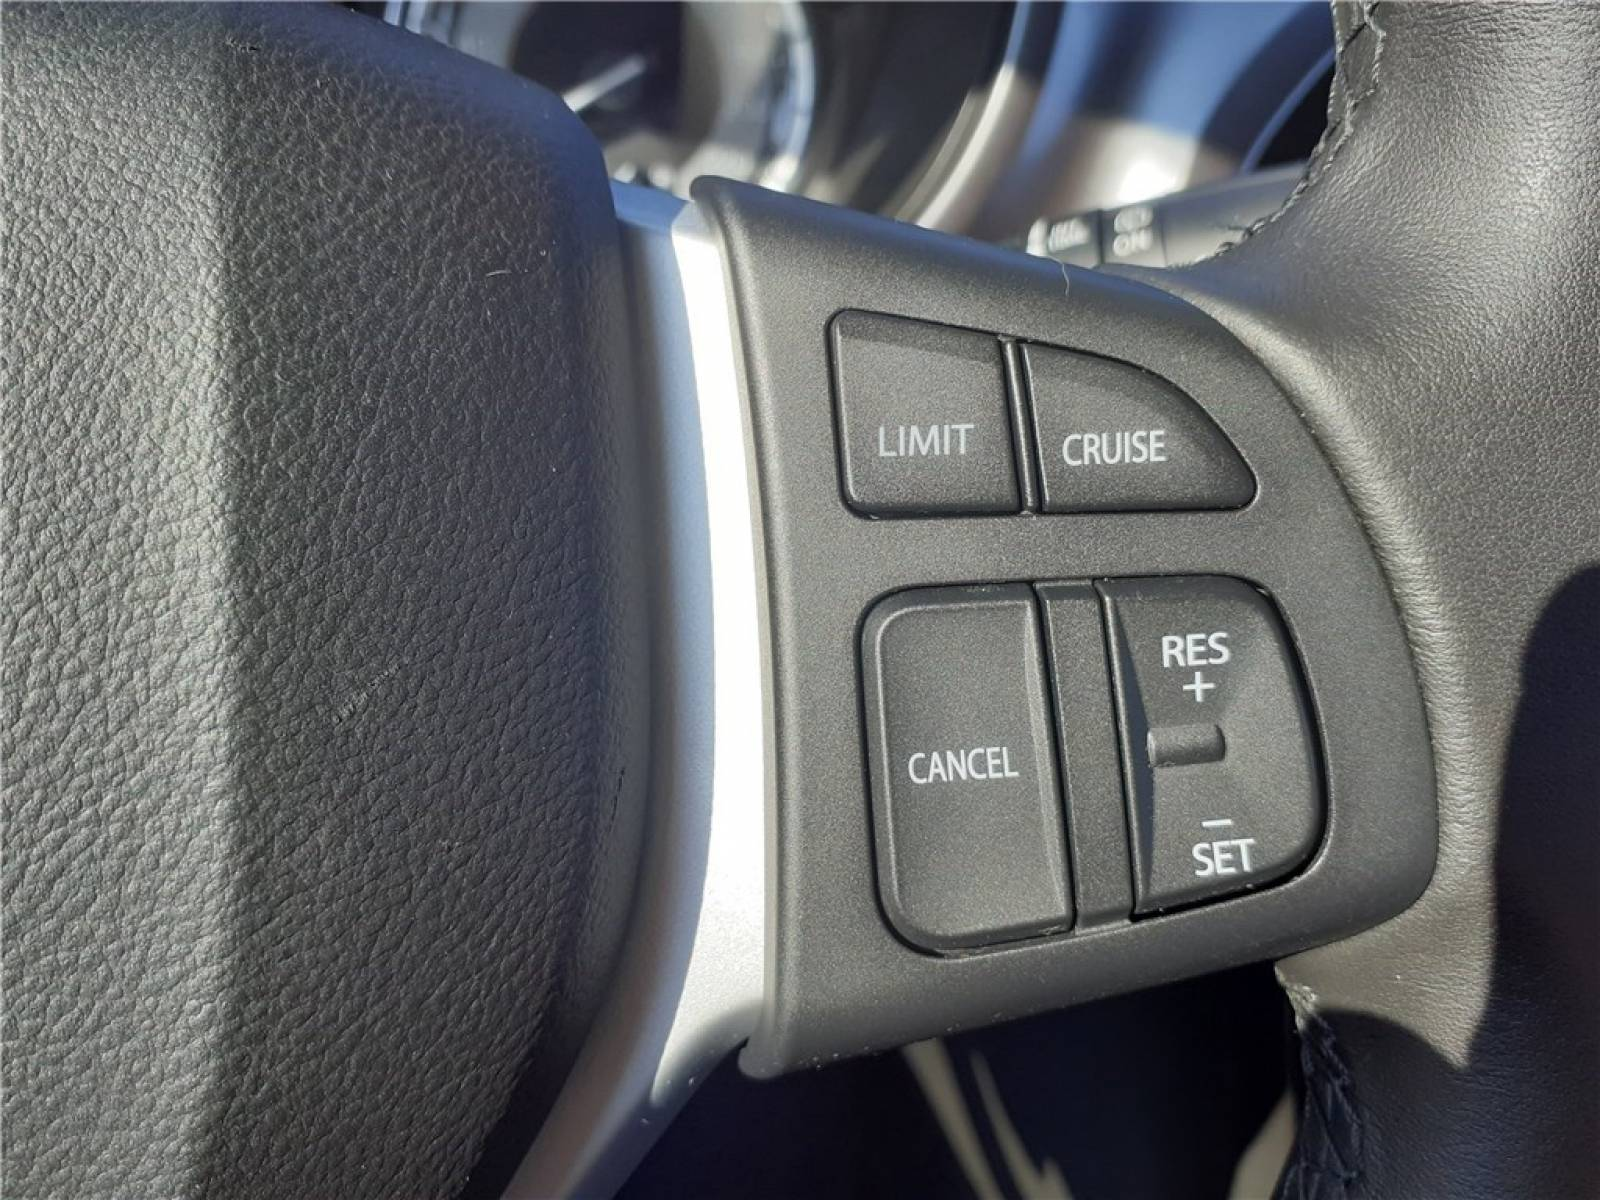 SUZUKI Vitara 1.0 Boosterjet - véhicule d'occasion - Groupe Guillet - Opel Magicauto - Chalon-sur-Saône - 71380 - Saint-Marcel - 31